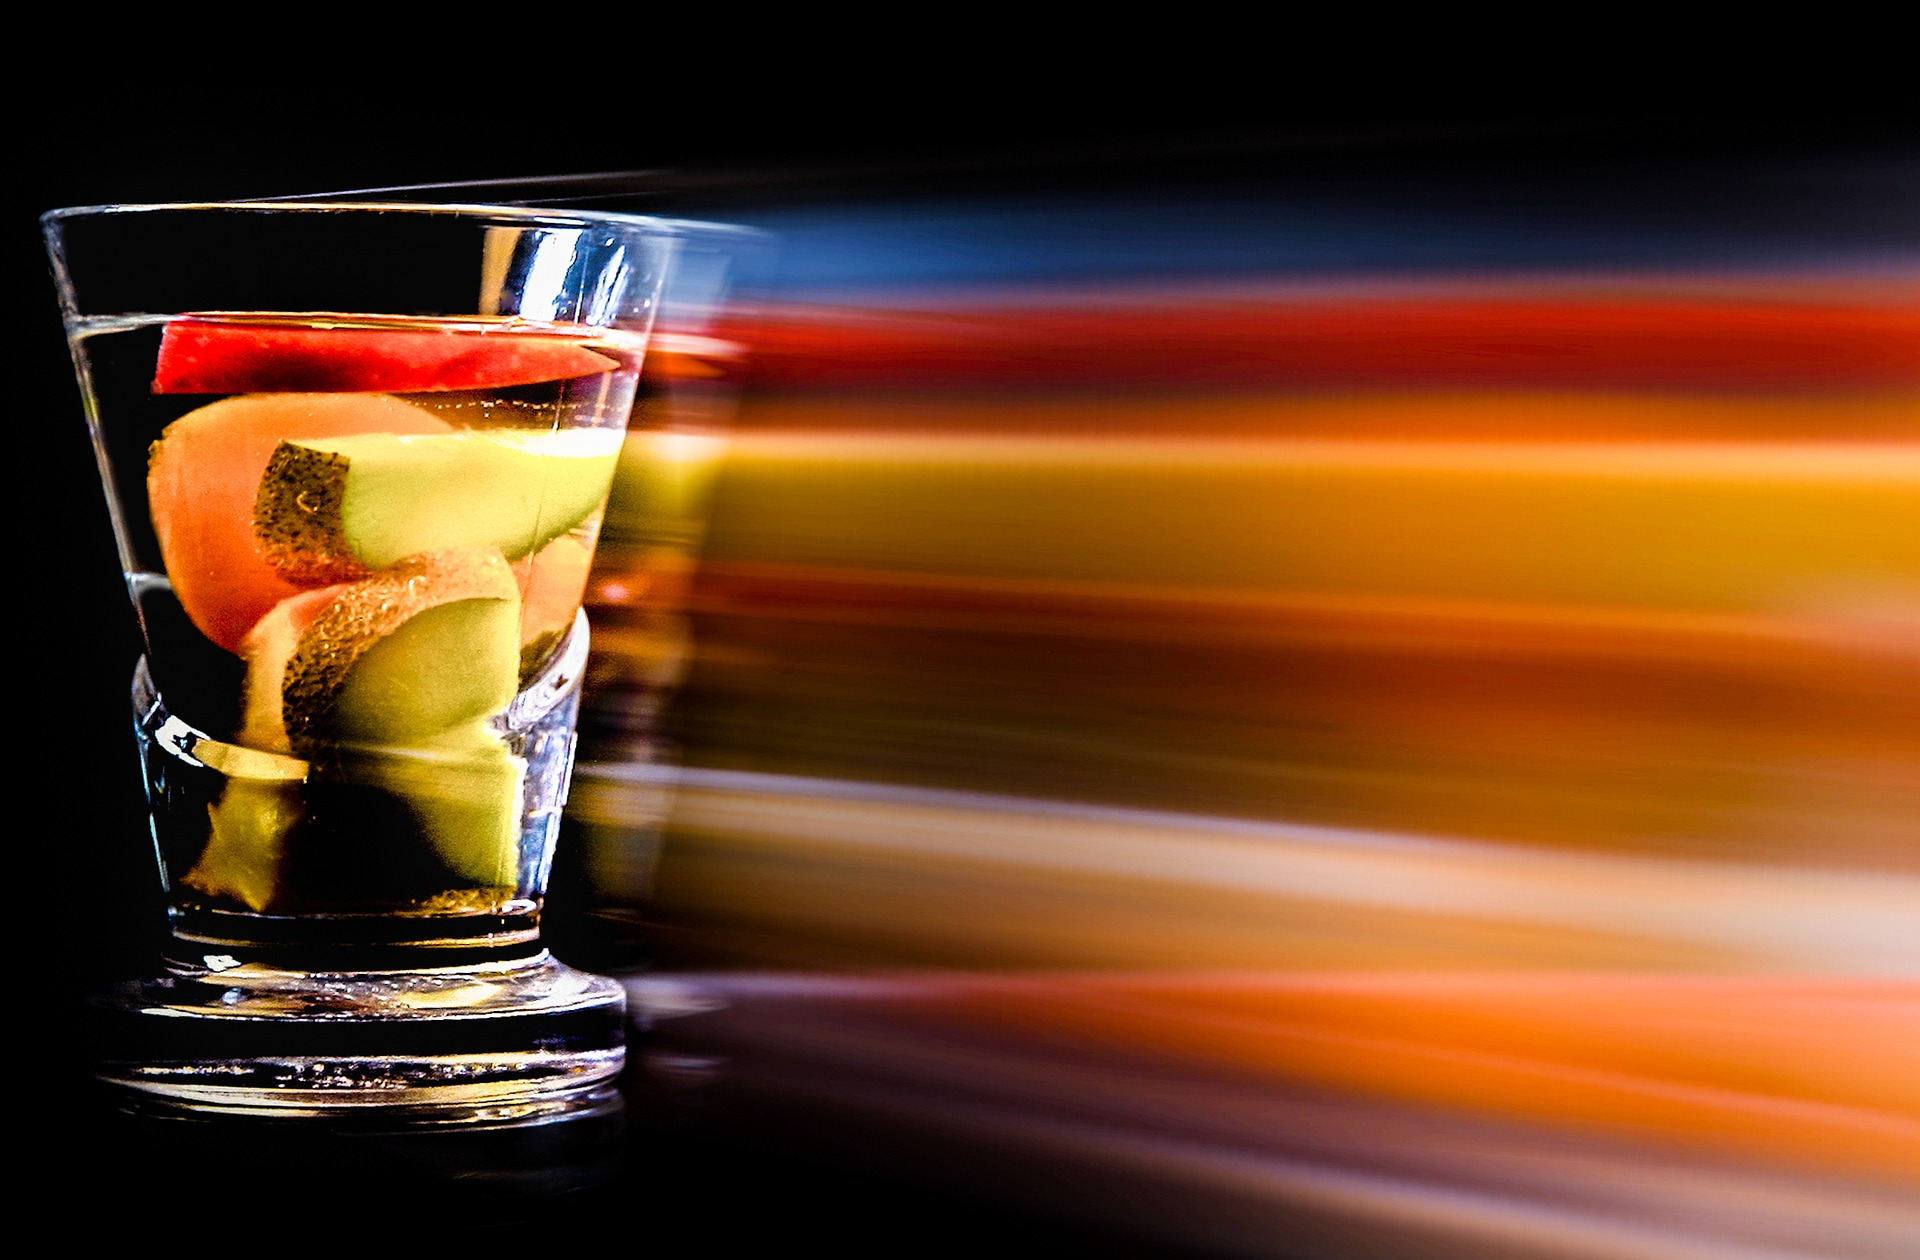 drink-2984376_1920.jpg